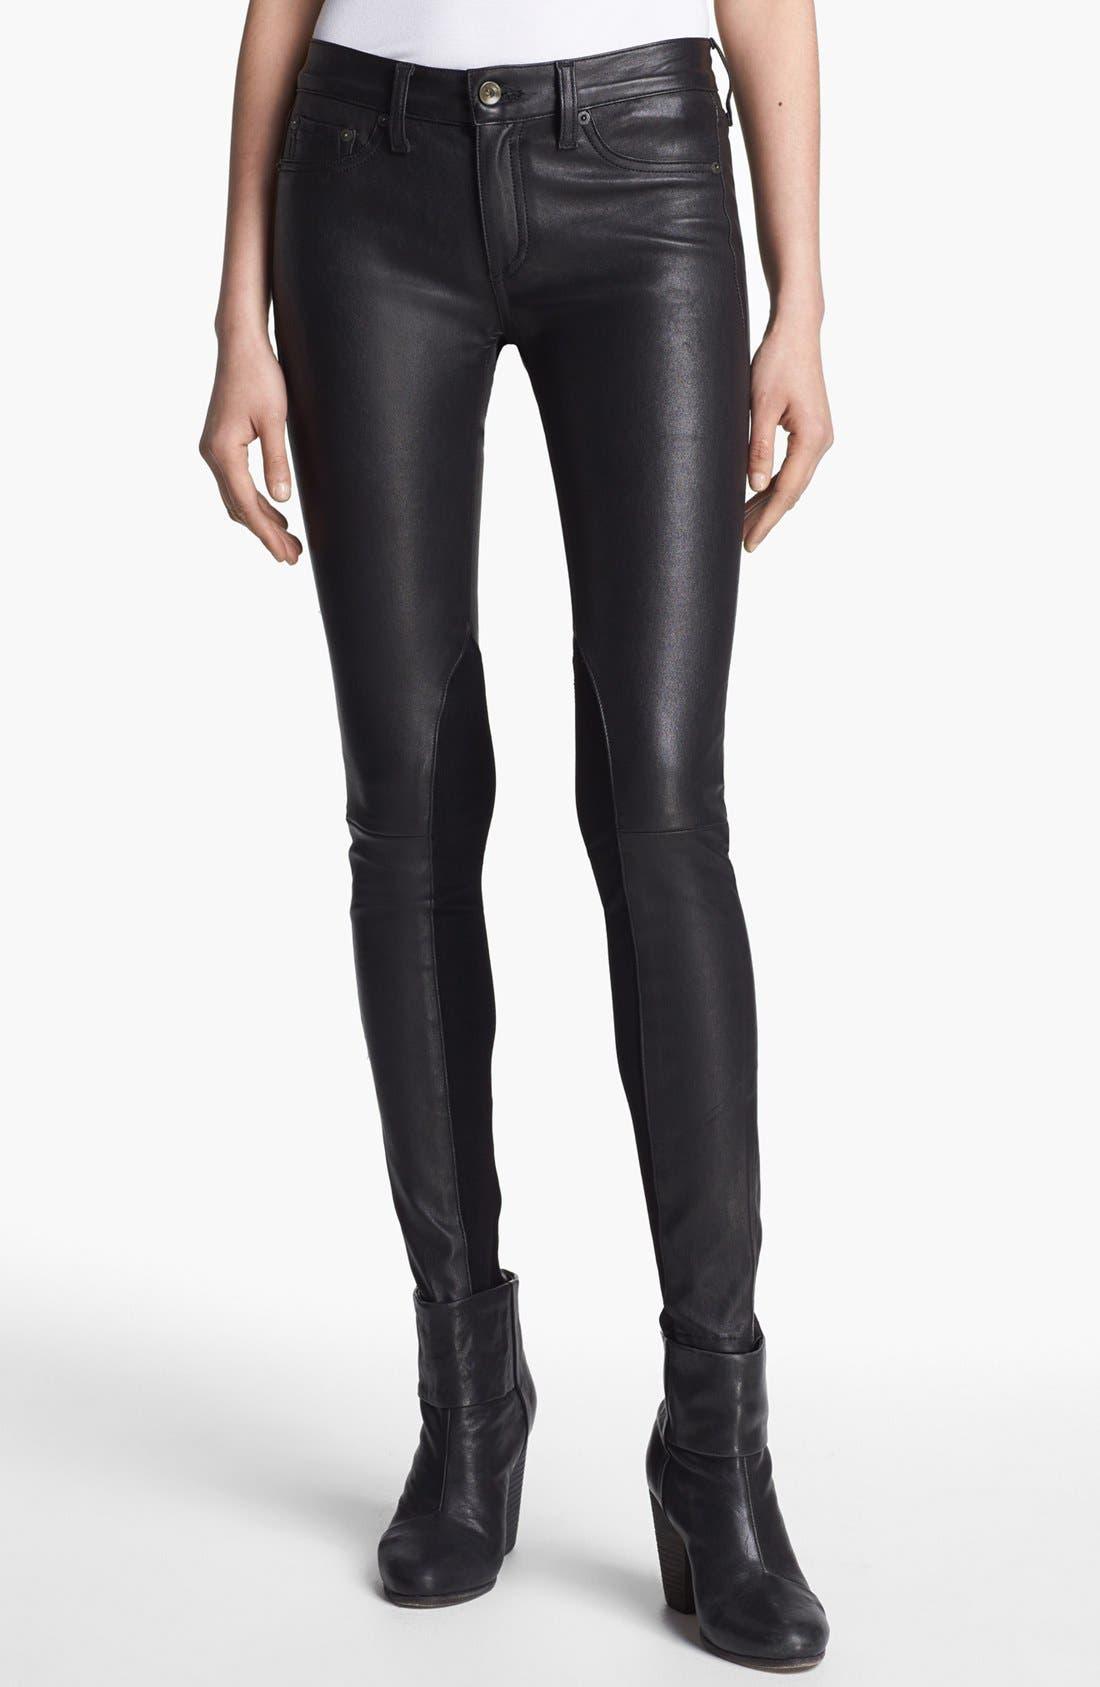 Alternate Image 1 Selected - rag & bone/JEAN 'The Reverse' Leather Pants